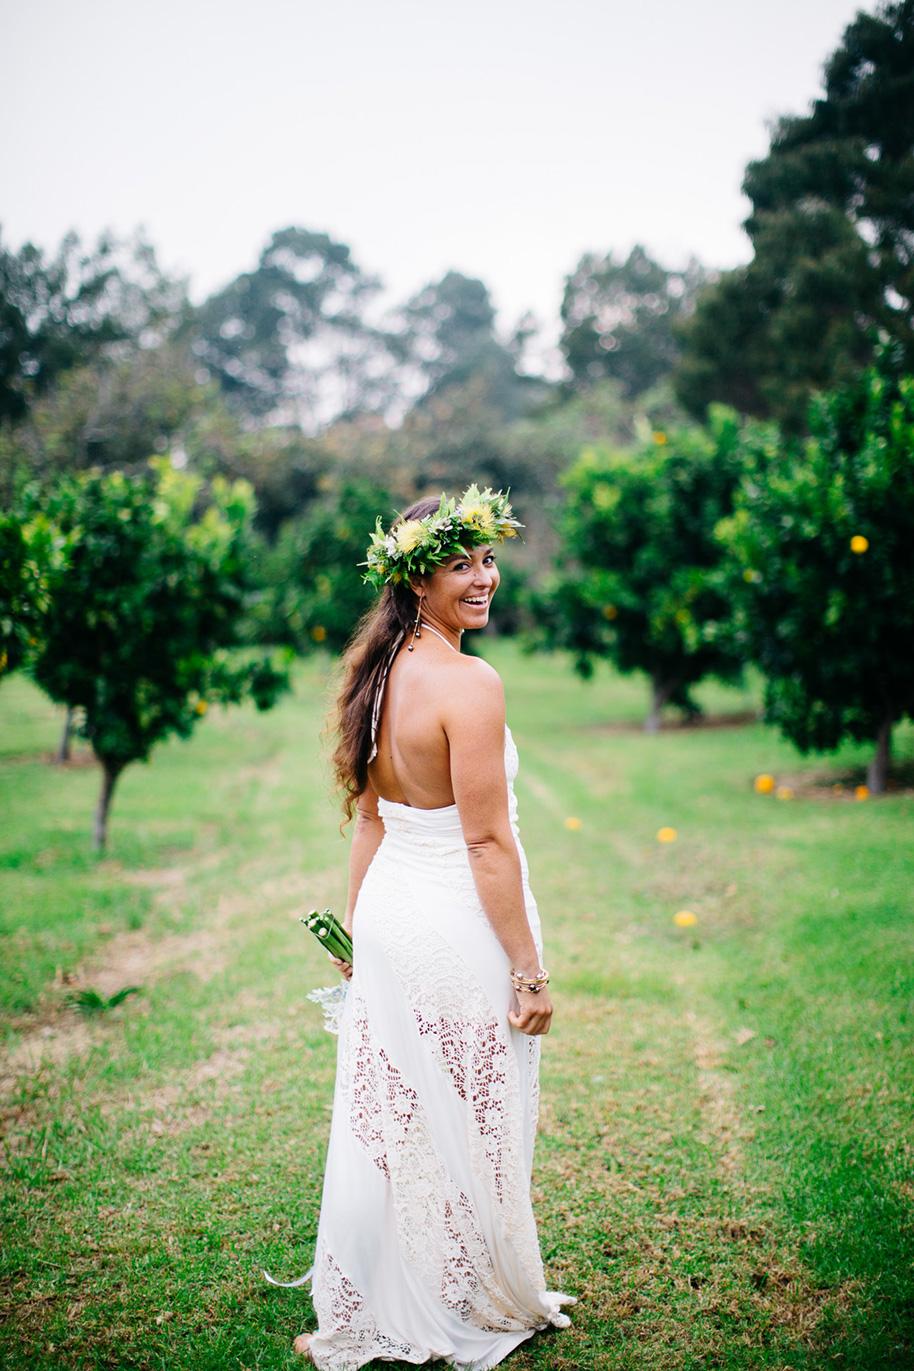 Maui-Ranch-Wedding-032717-21.jpg